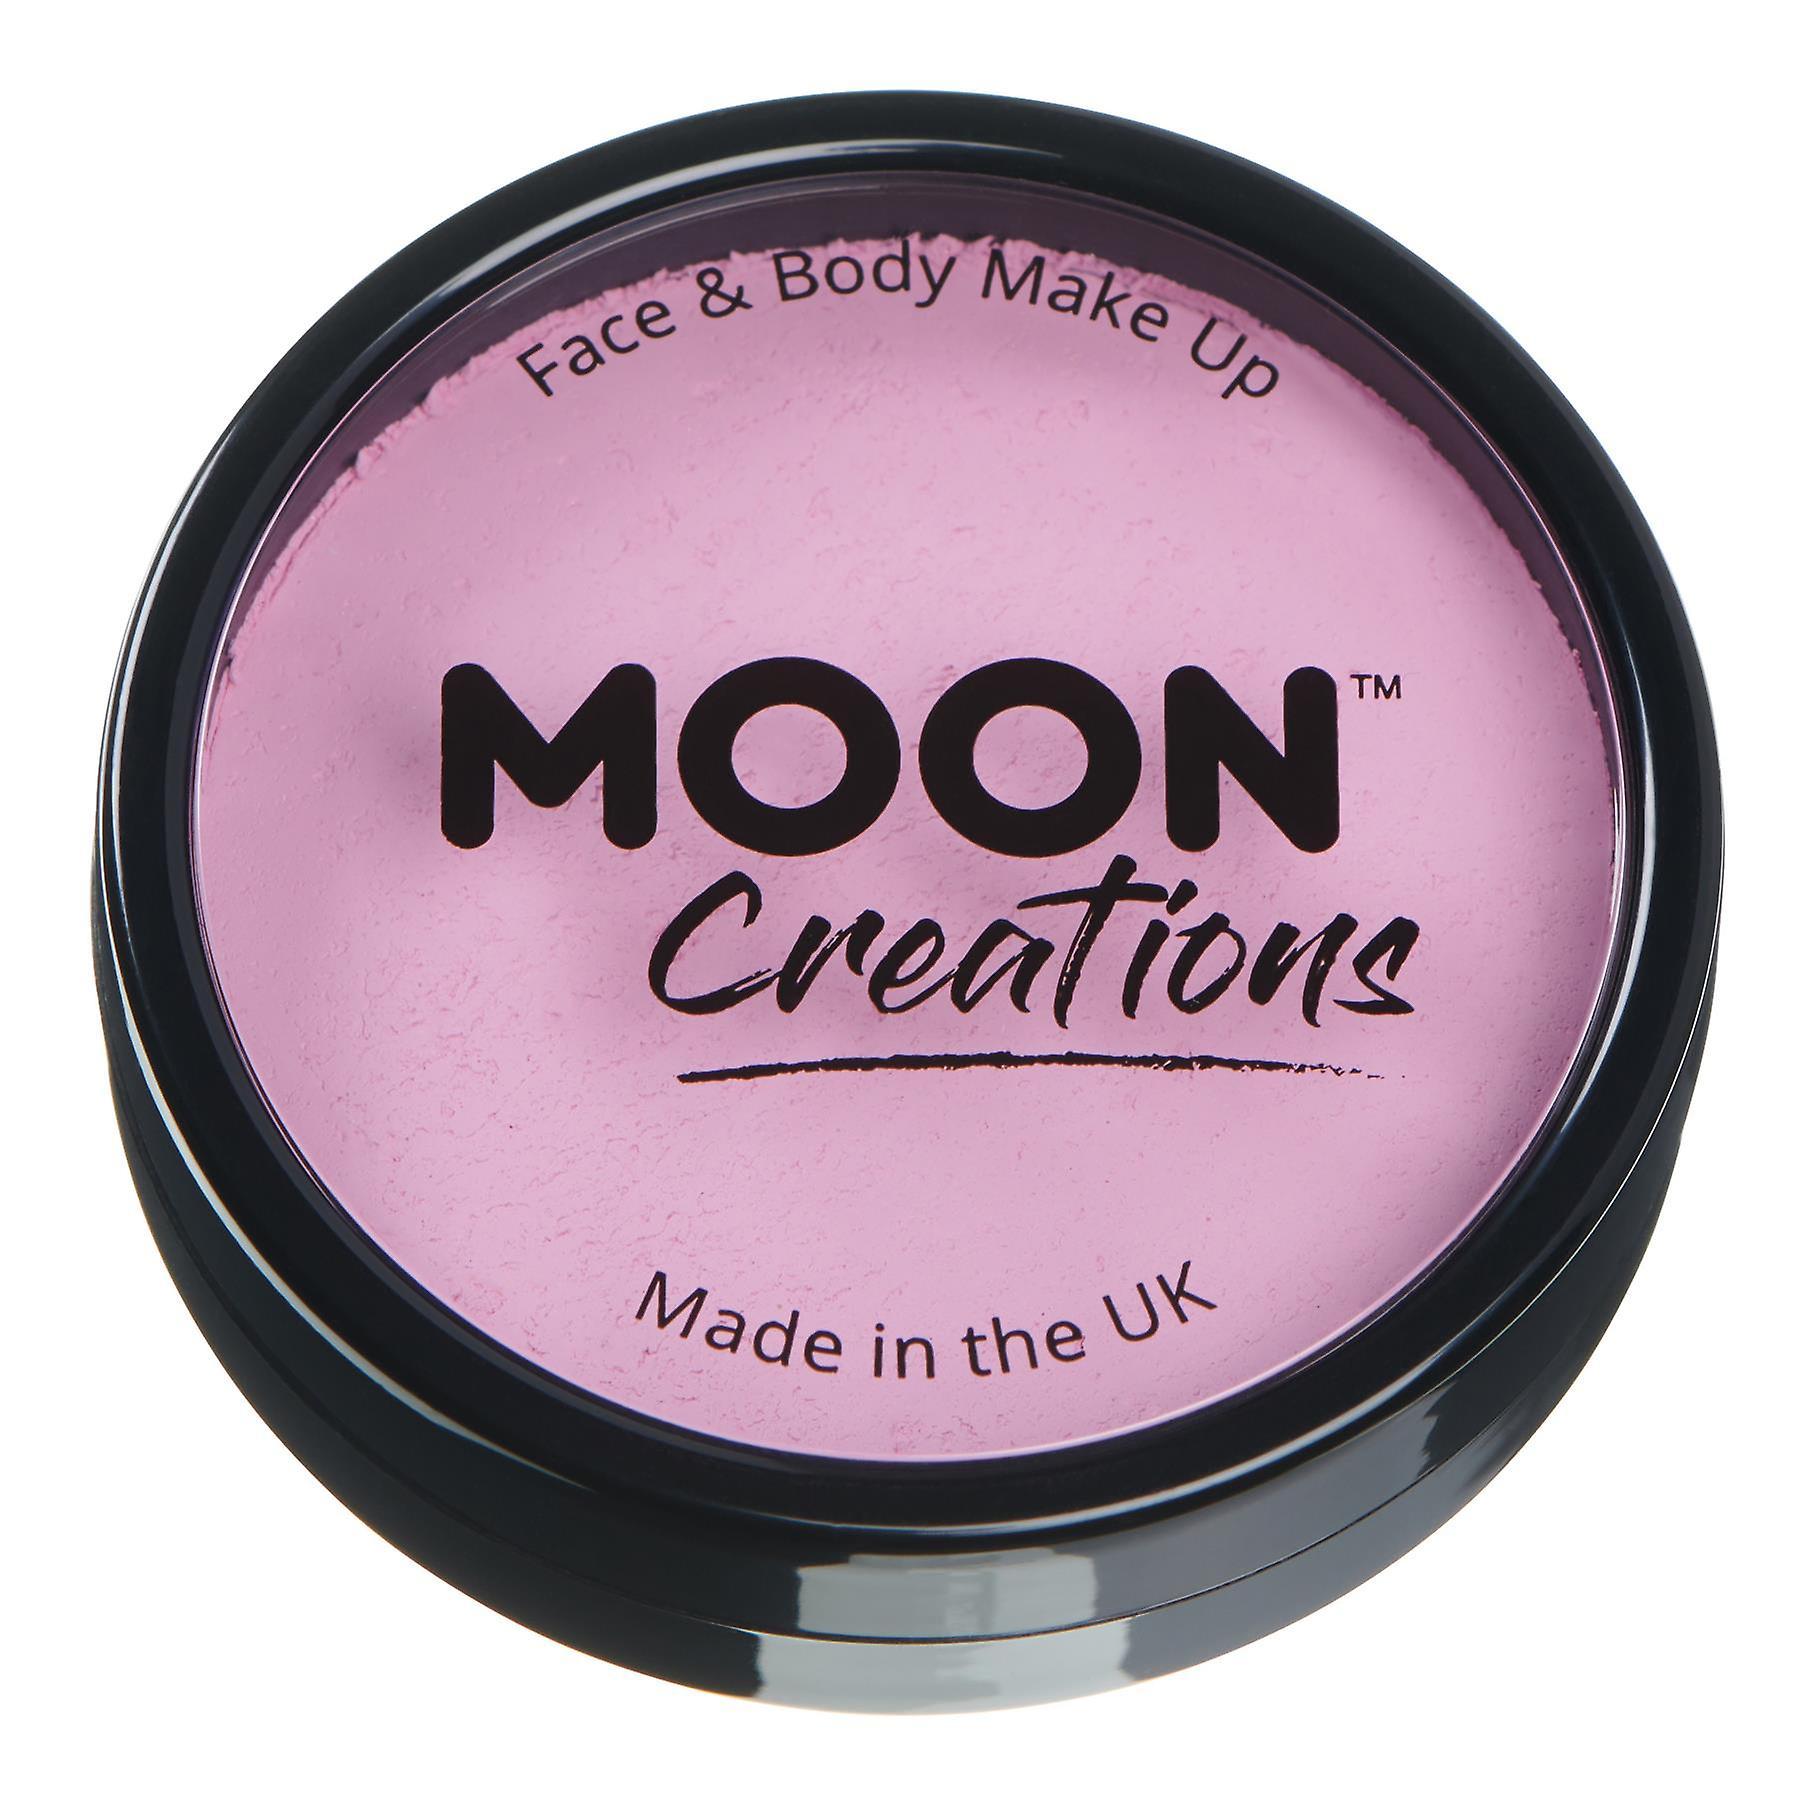 Moon Creations - Pro Face & Body Paint Cake Pots - Light Pink